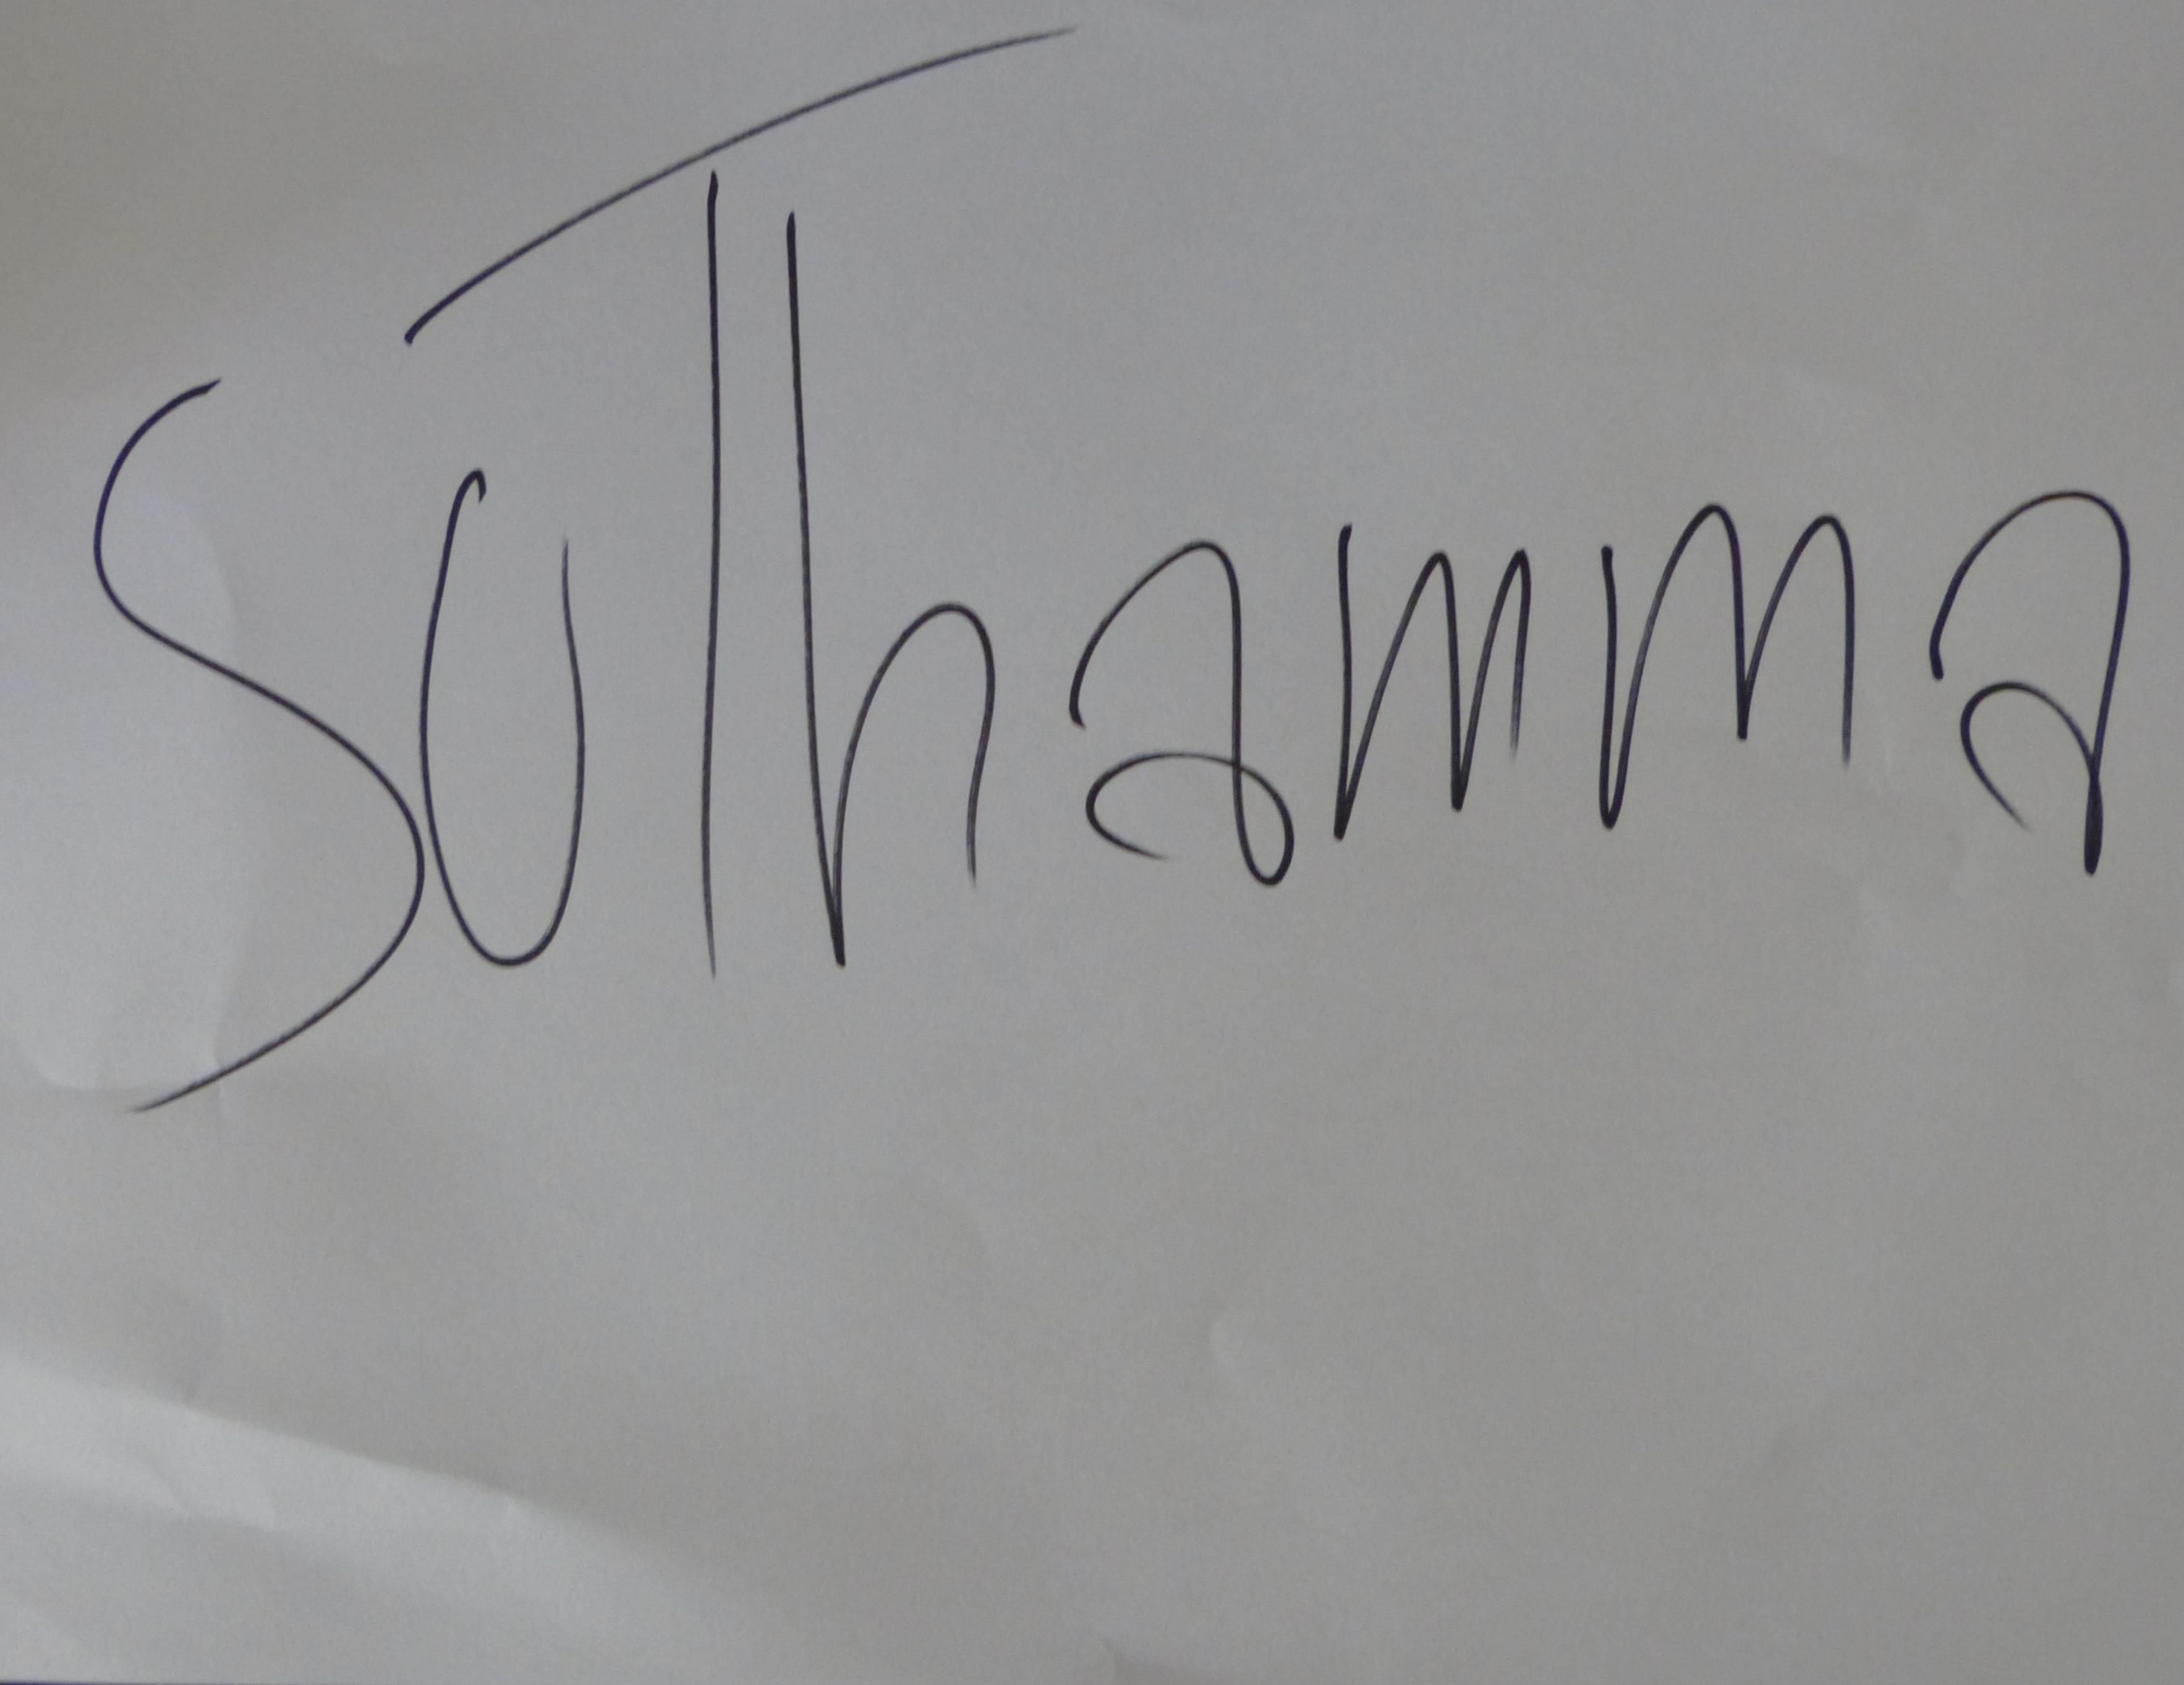 Suthamma Thimkaeo Signature